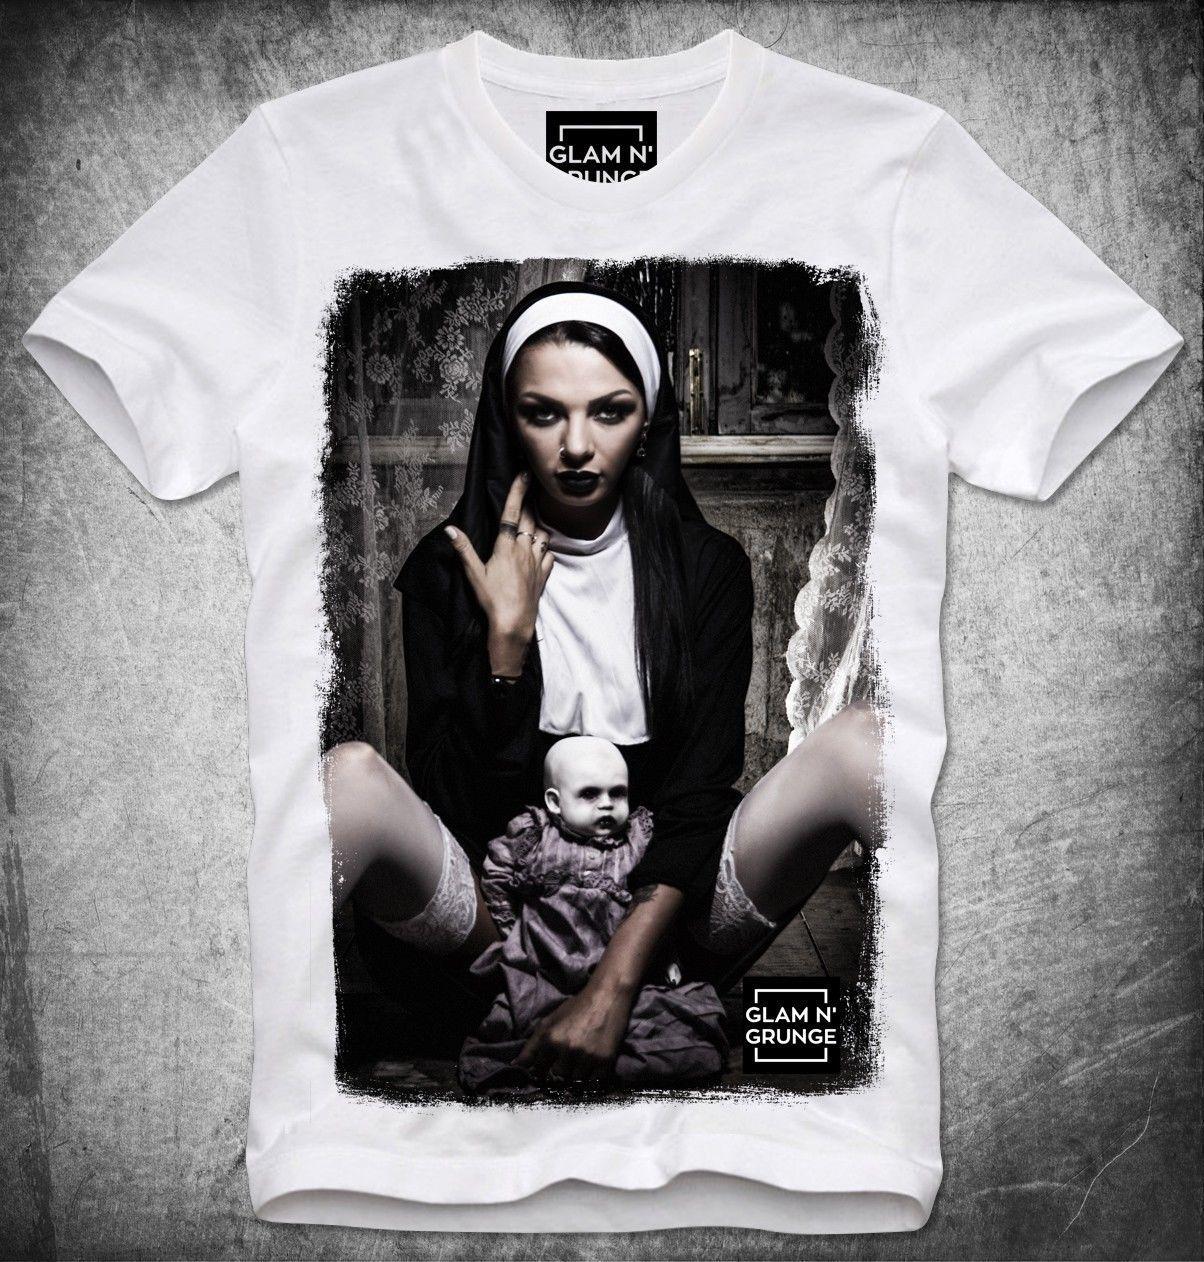 e029bc874 GLAM N GRUNGE T SHIRT SEXY GIRL NUN NONNE SATAN SATANIC CHURCH OF LAVEY  BAPHOMET Men Women Unisex Fashion Tshirt Buy Cool T Shirts Online Funny  Offensive T ...